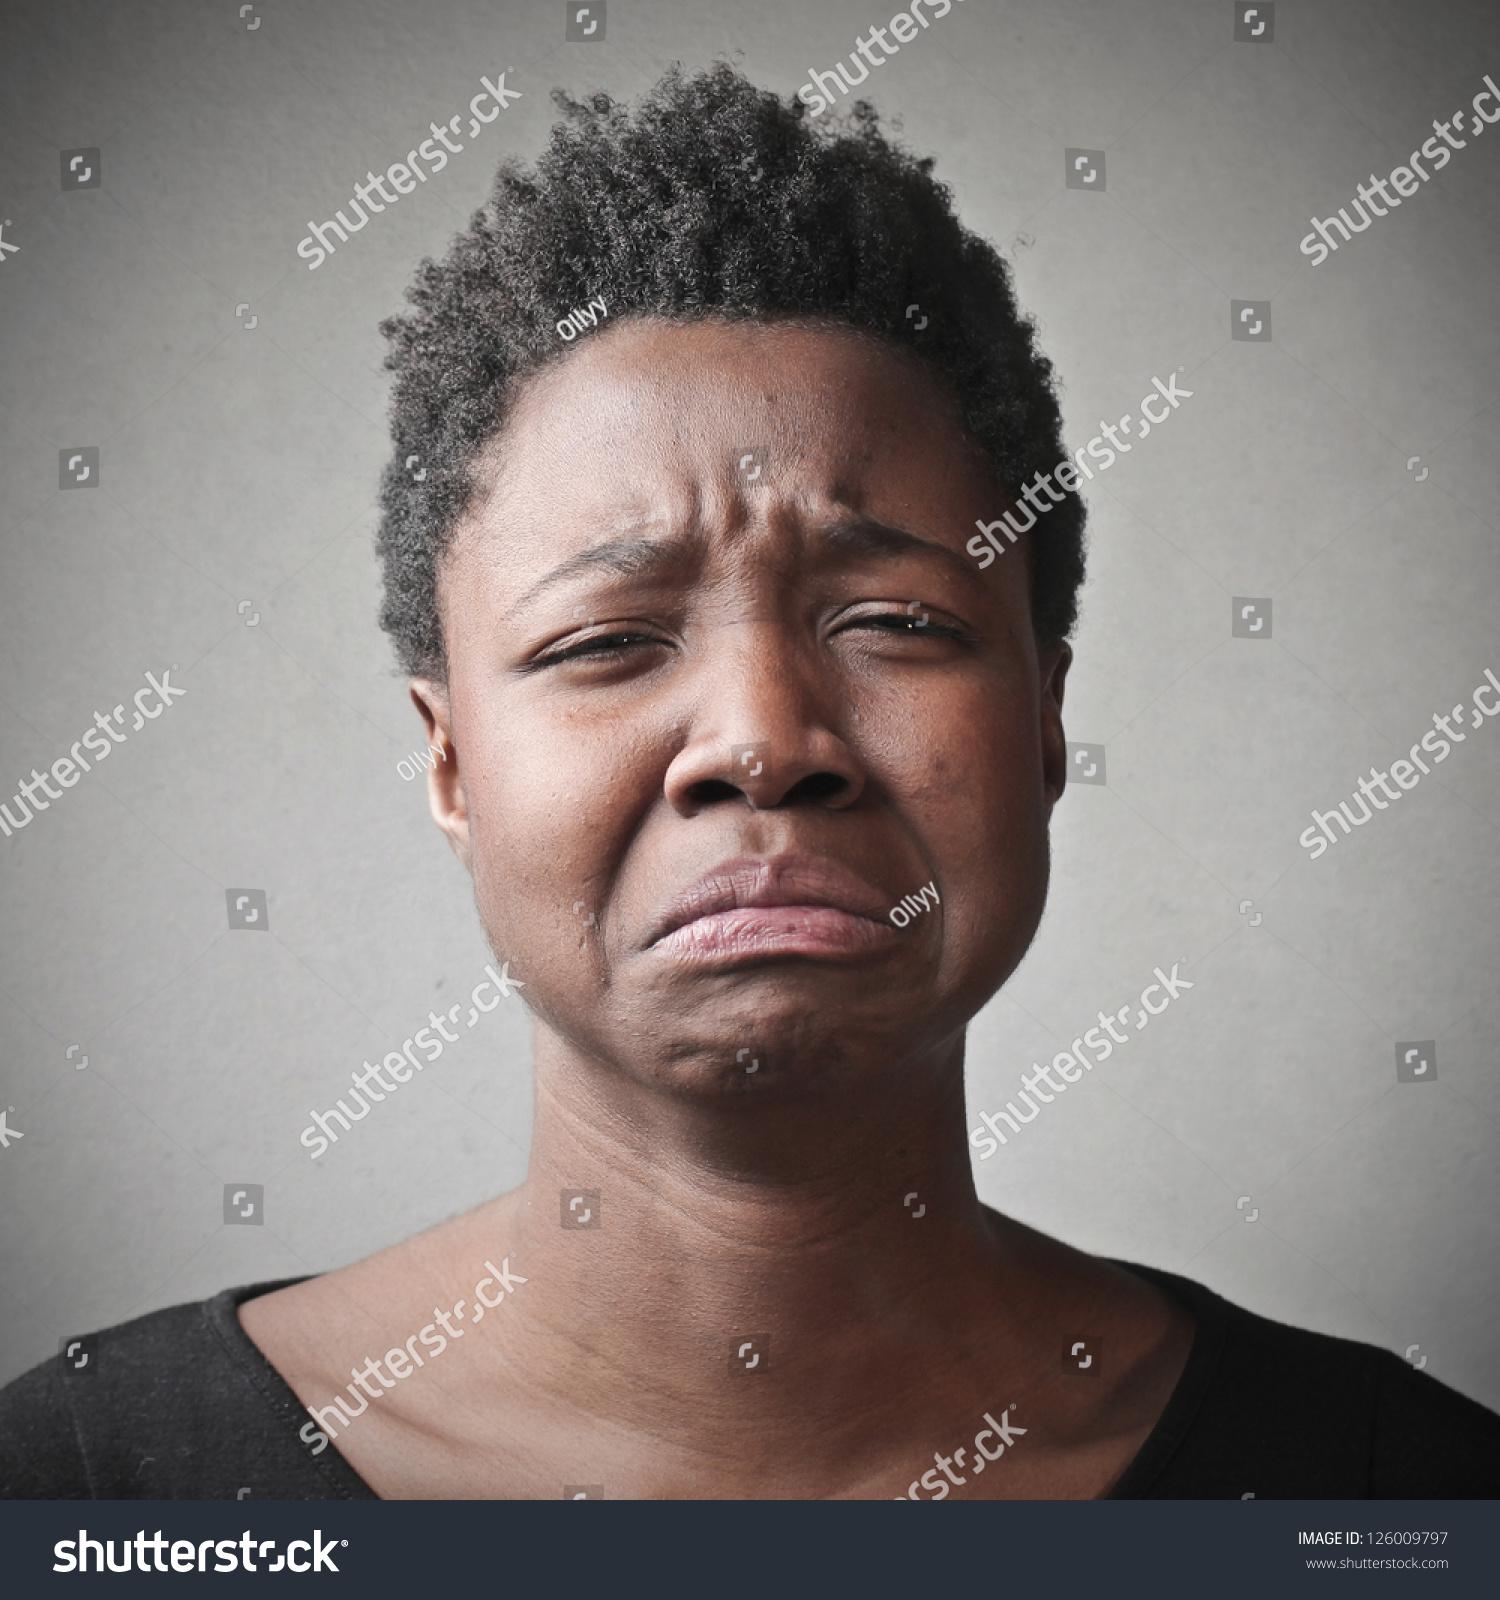 Stock Photo Black Sad